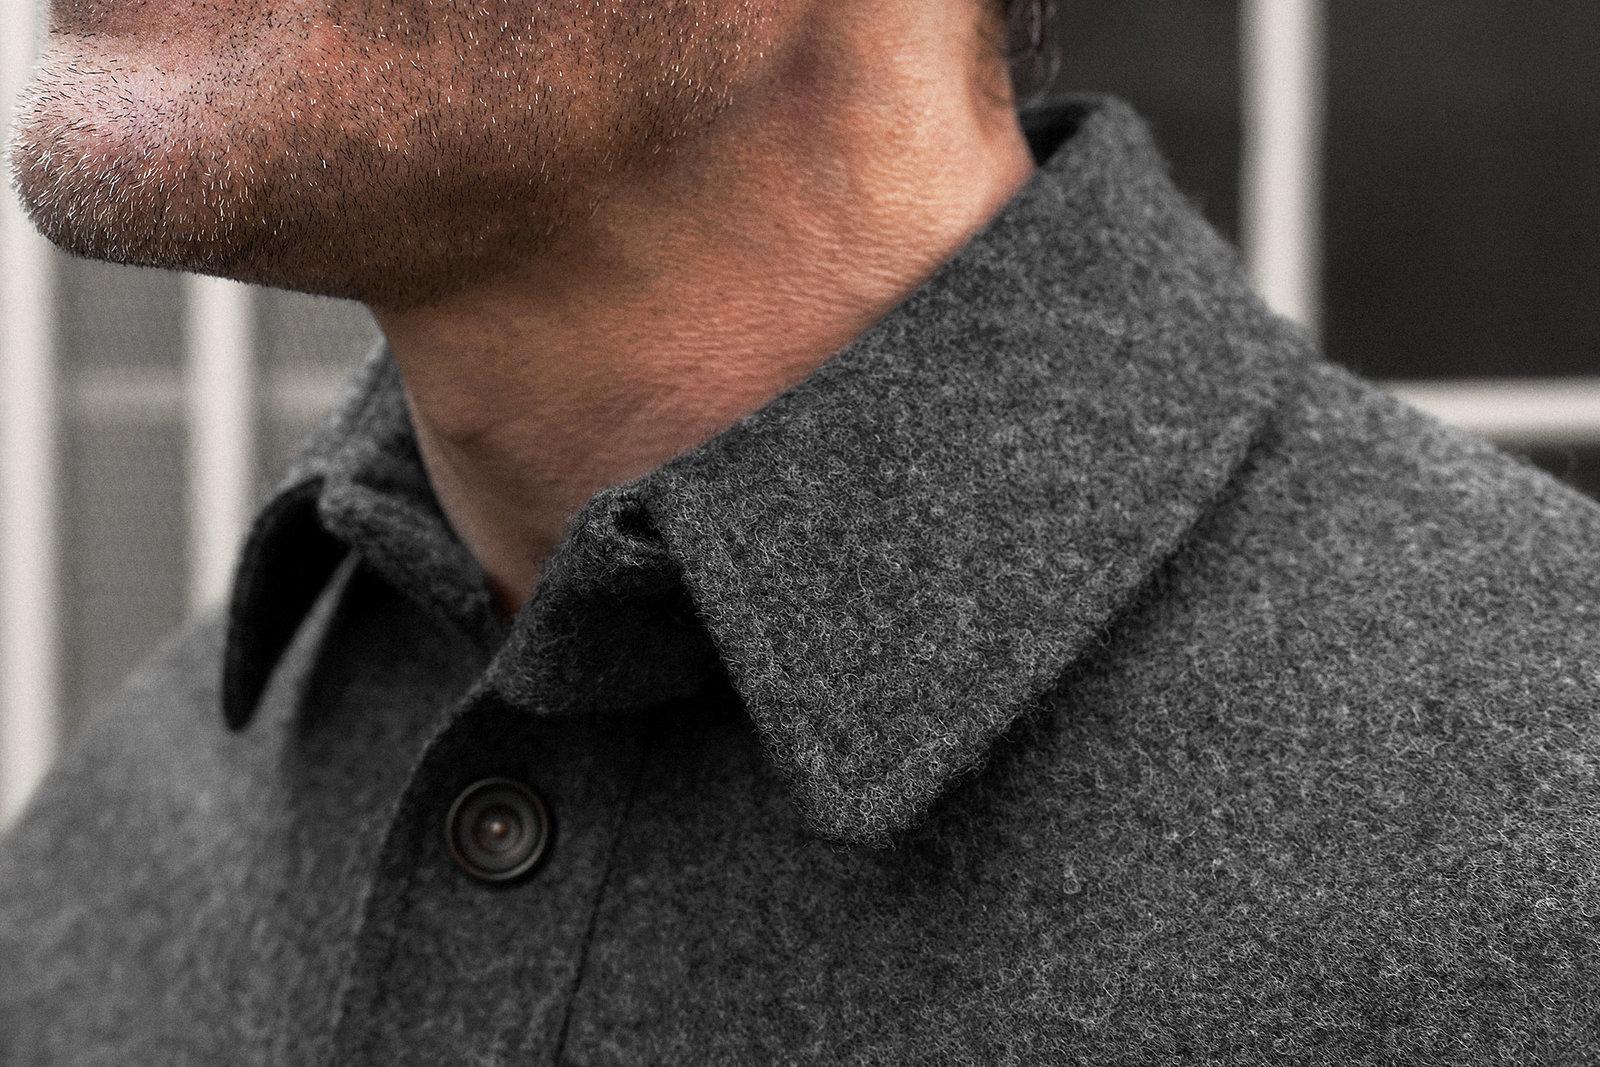 field-shirt-woollen-melton-grey-worn-1@2x.jpg